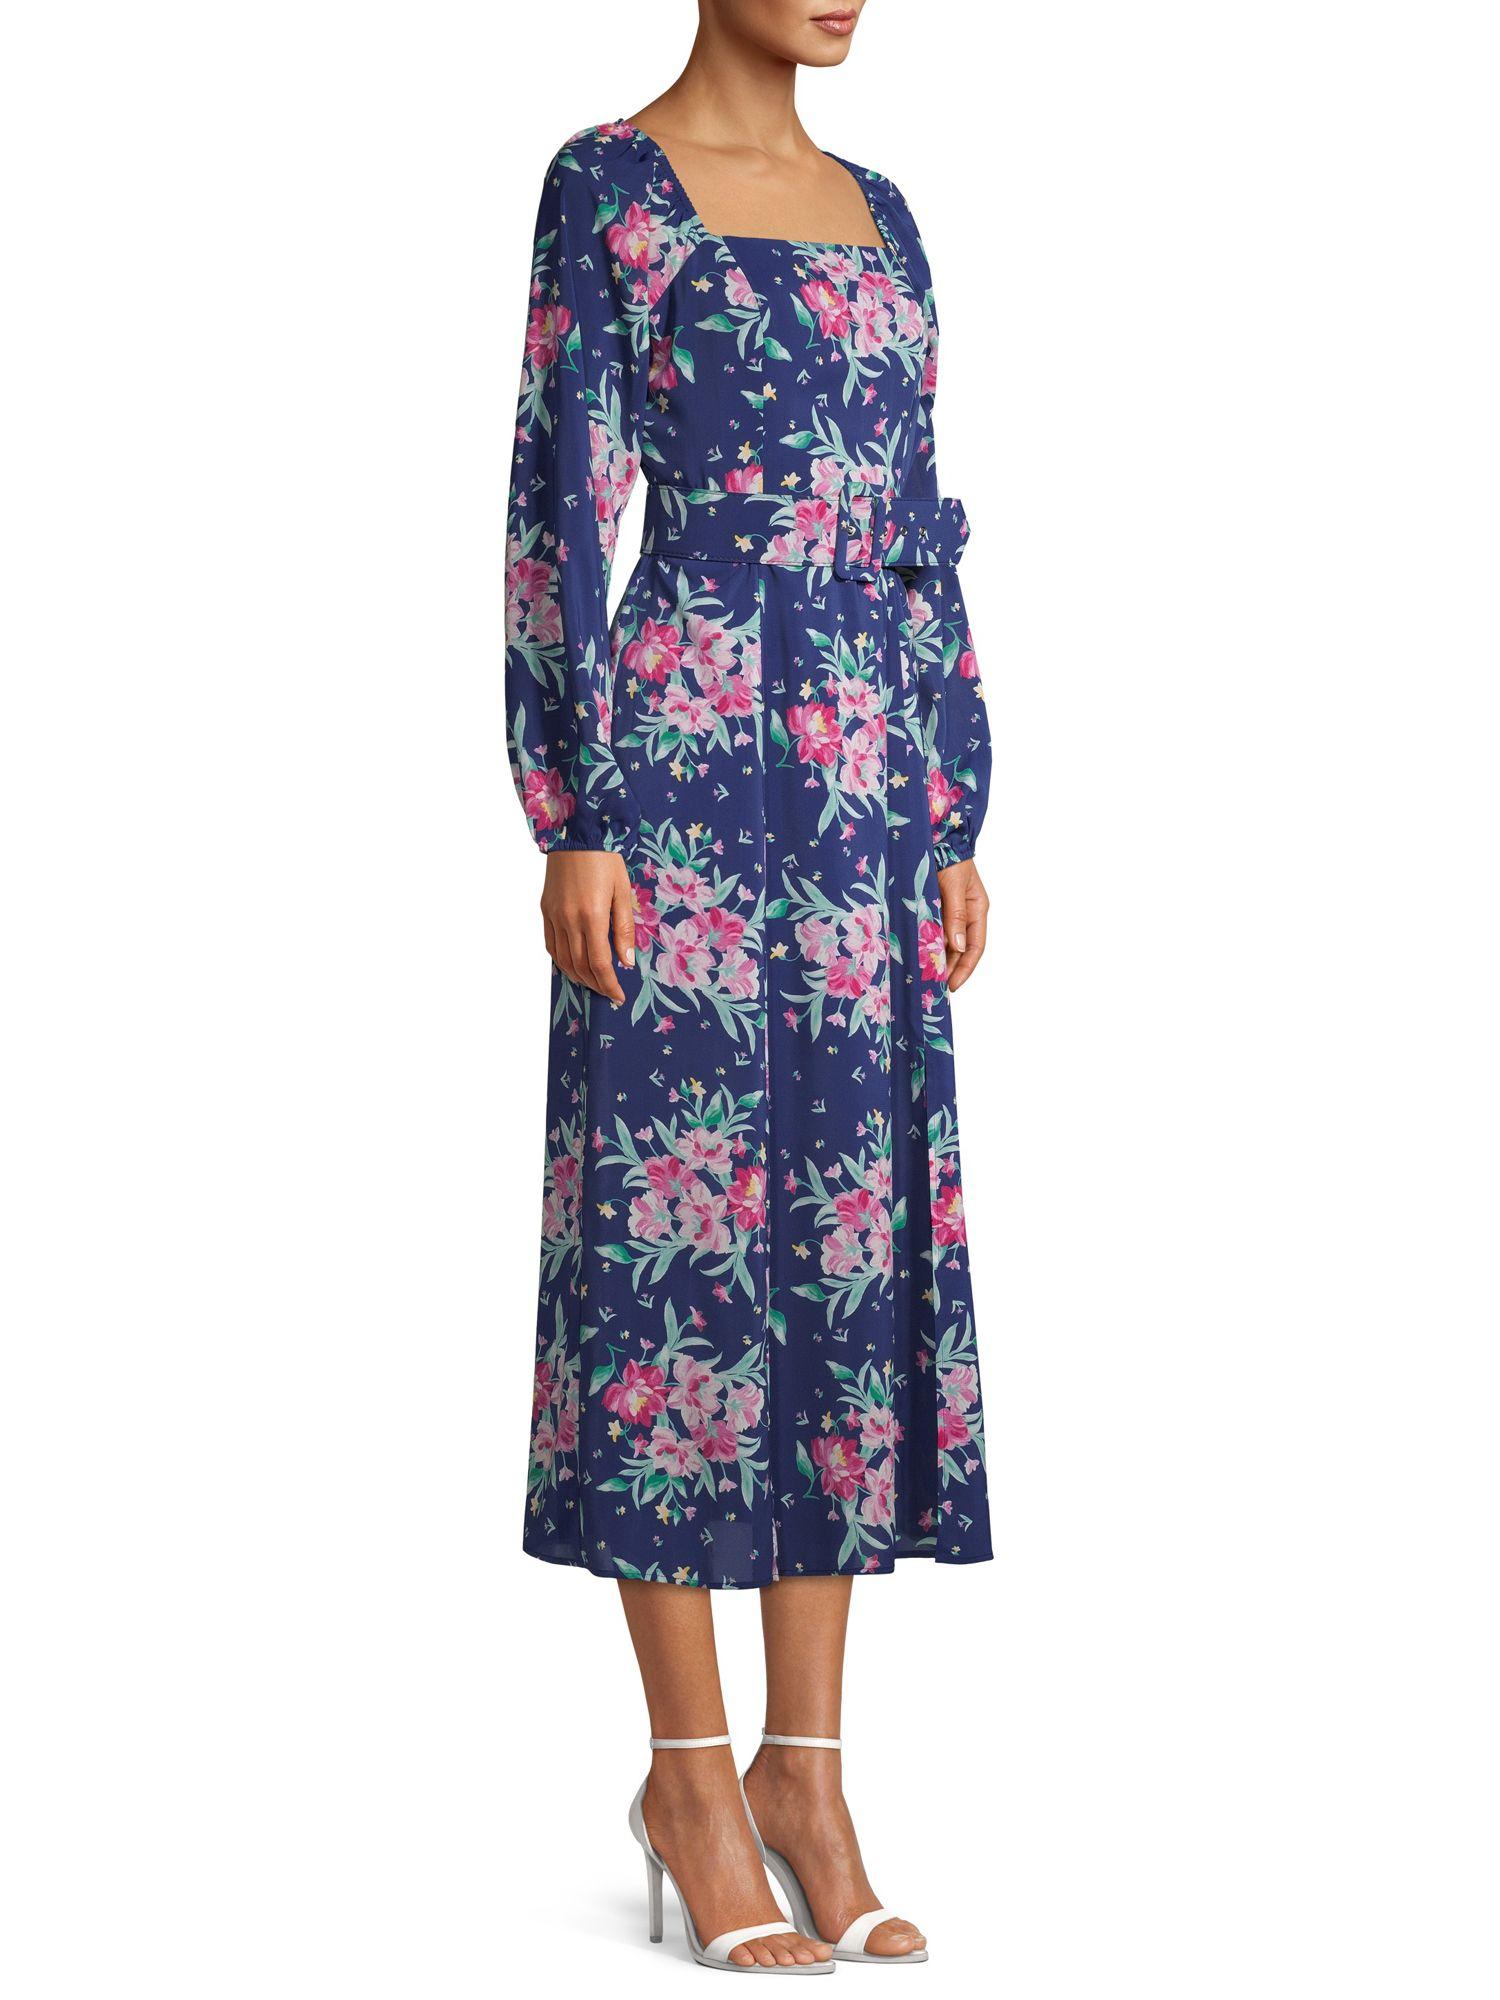 Prospect The Label Prospect The Label Women S Belted Midi Dress Walmart Com Belted Midi Dress Dresses Midi Dress [ 2000 x 1500 Pixel ]